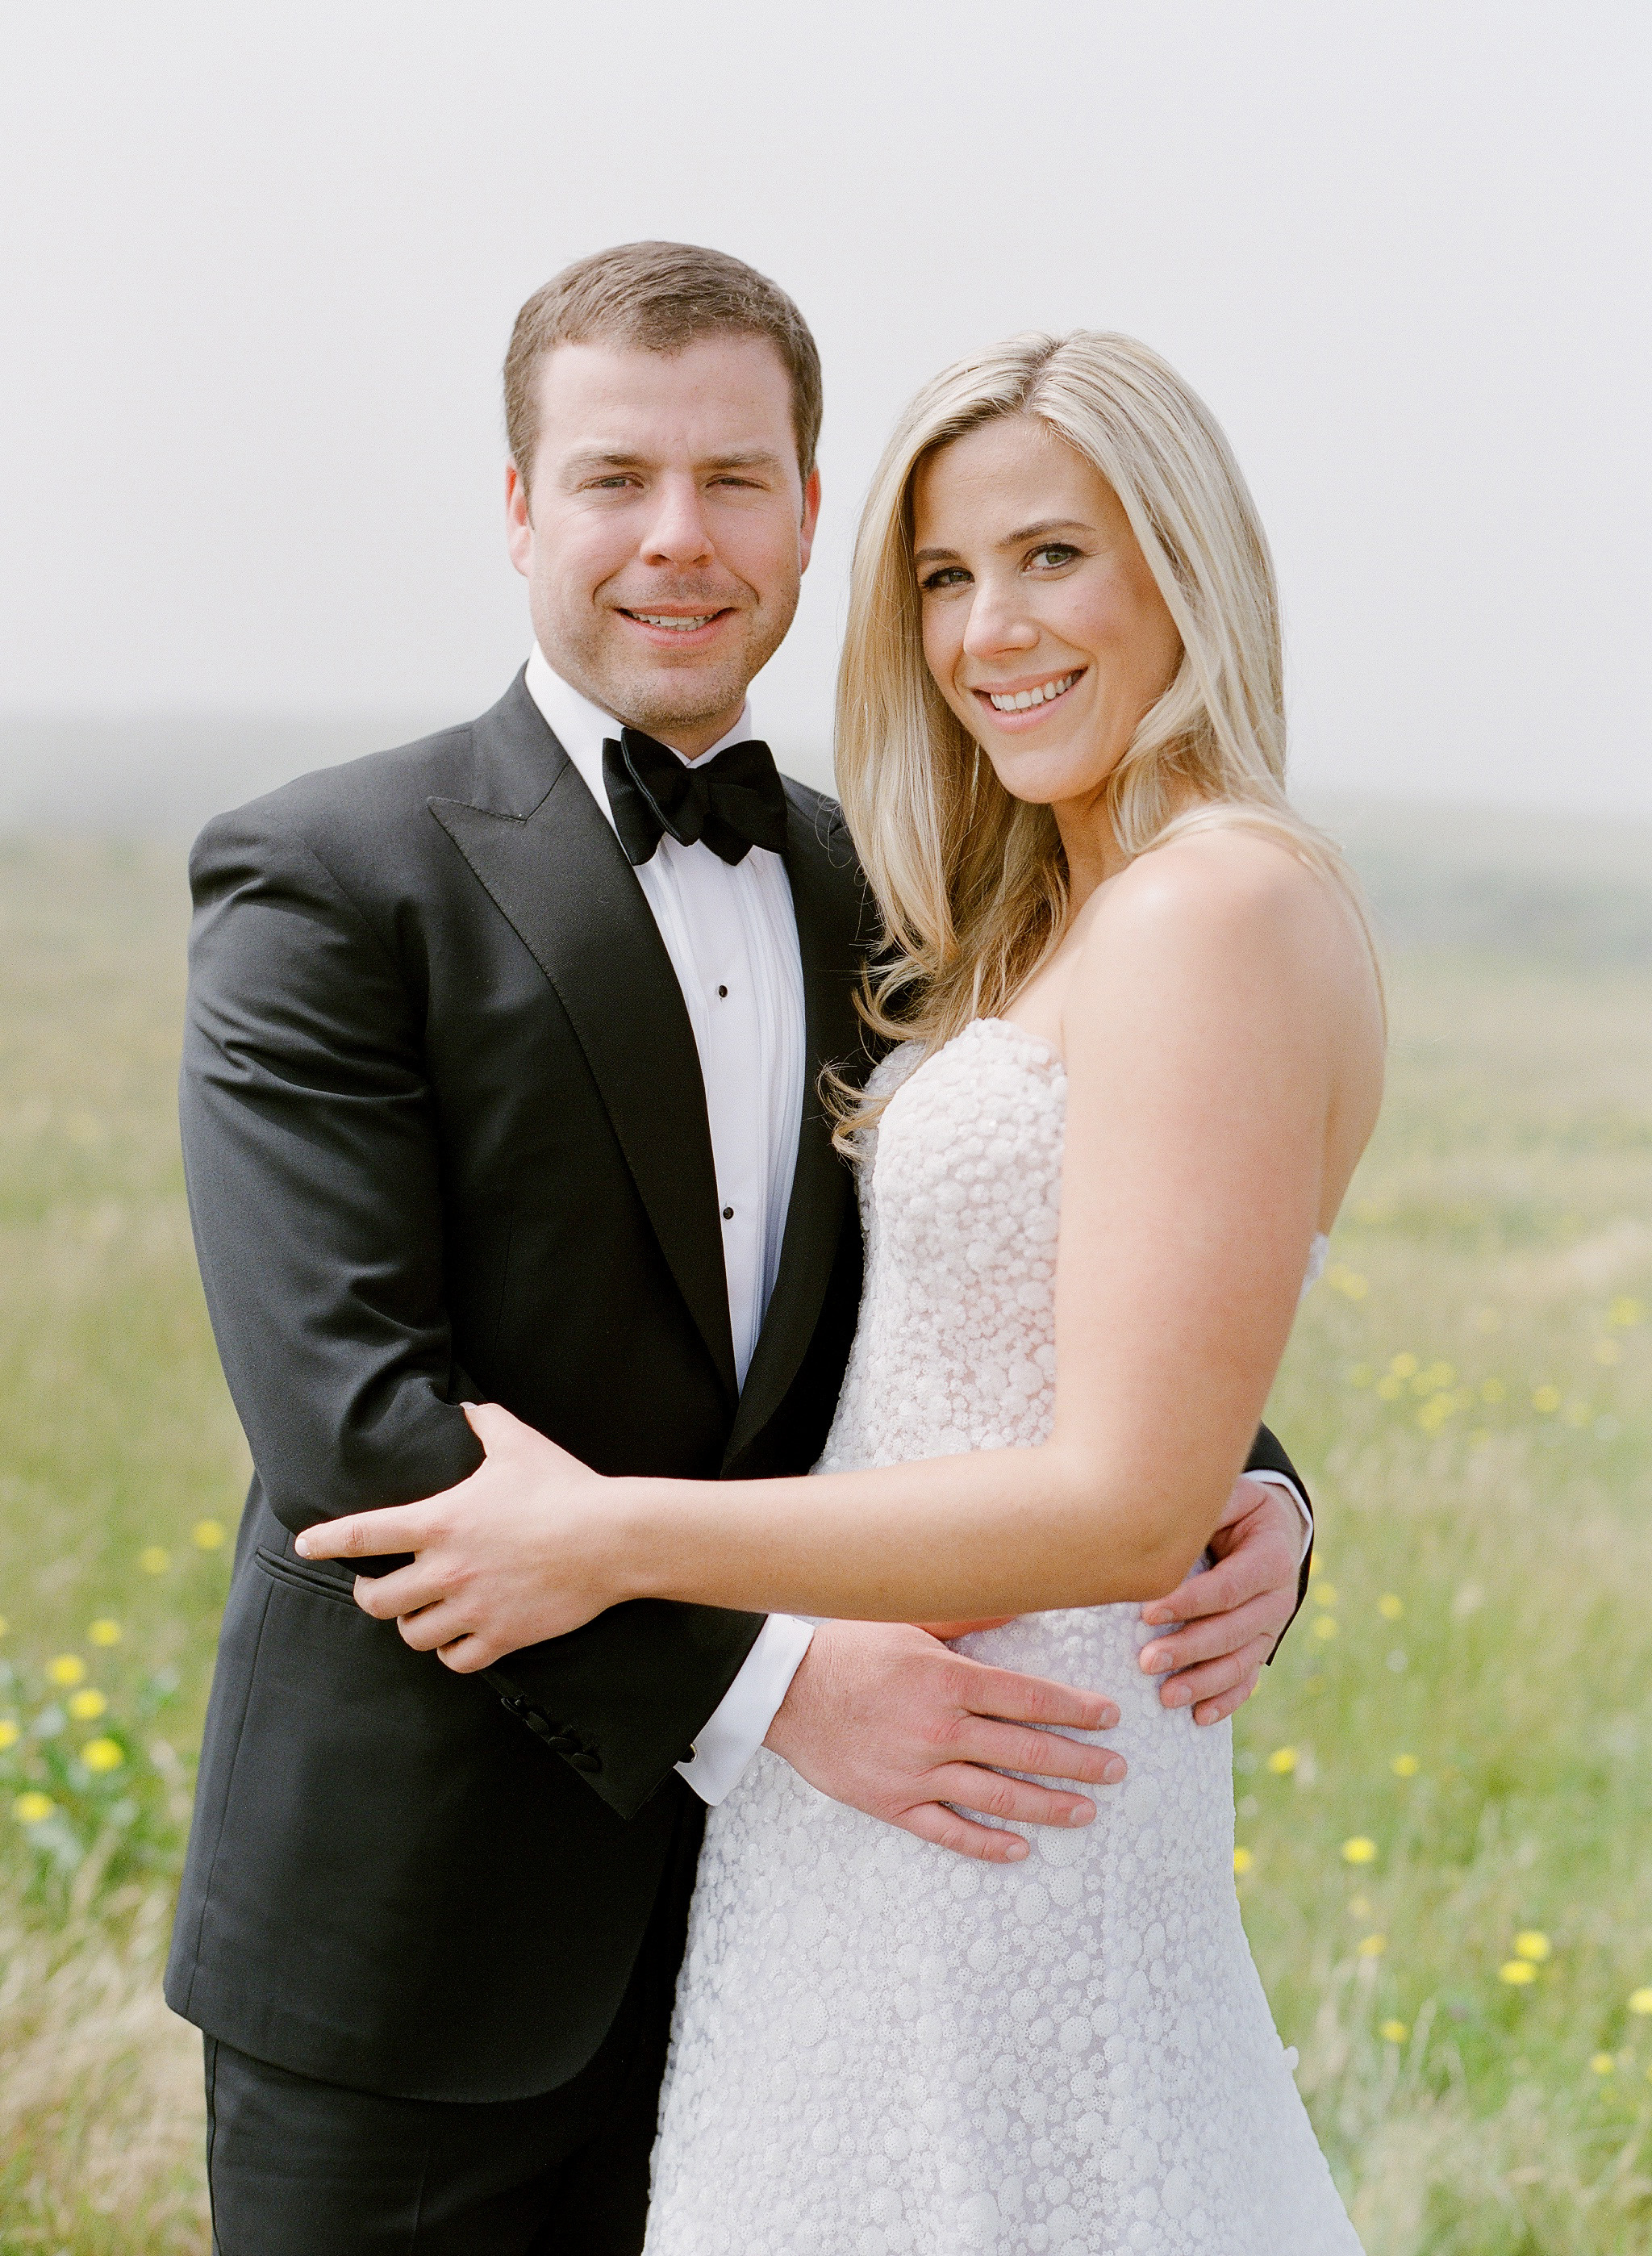 whitney zach wedding couple embracing in field